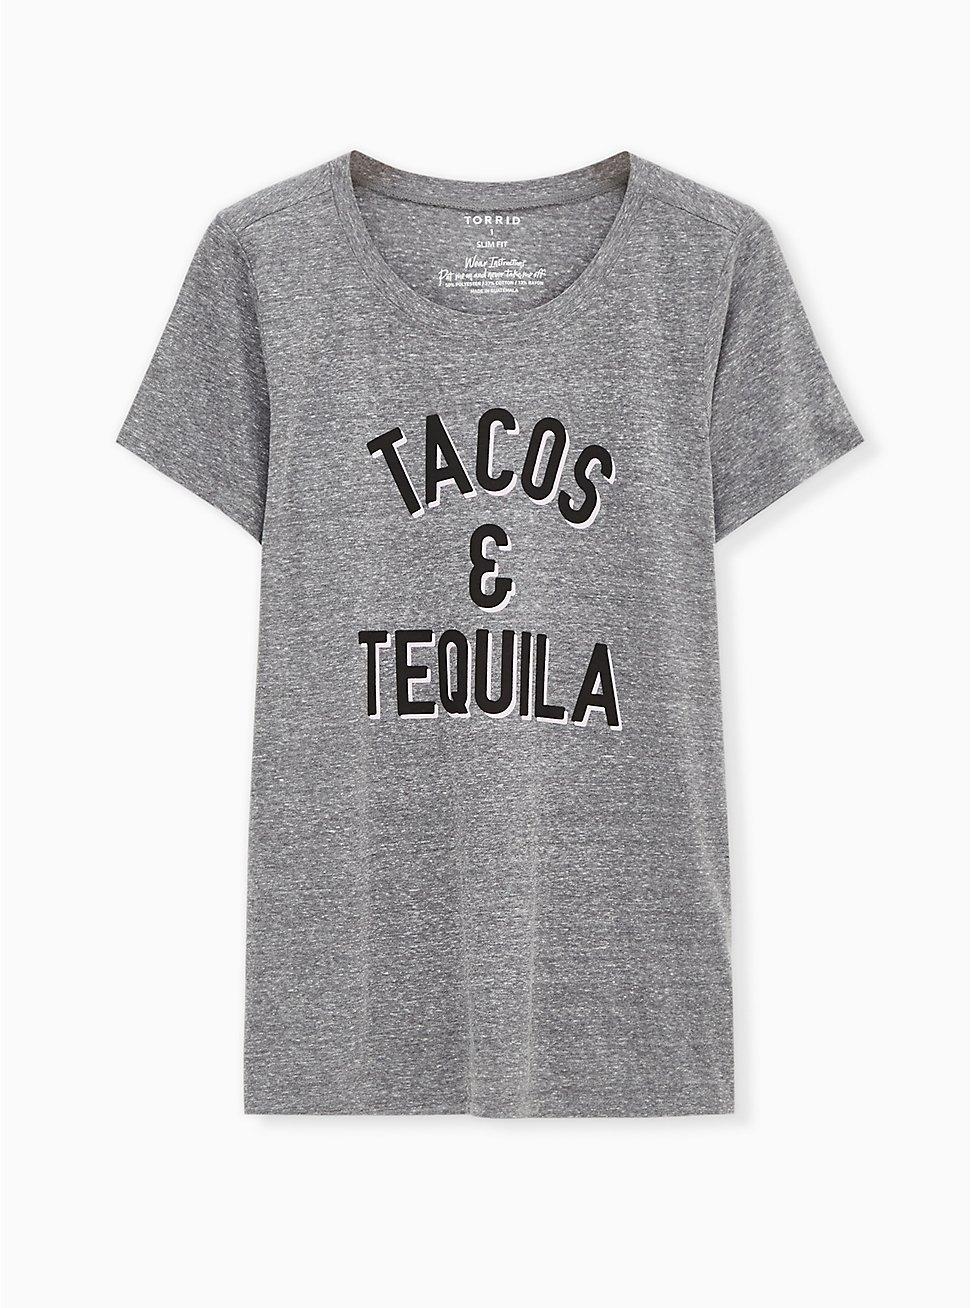 Tacos & Tequila Slim Fit Crew Tee - Triblend Jersey Heather Grey, MEDIUM HEATHER GREY, hi-res